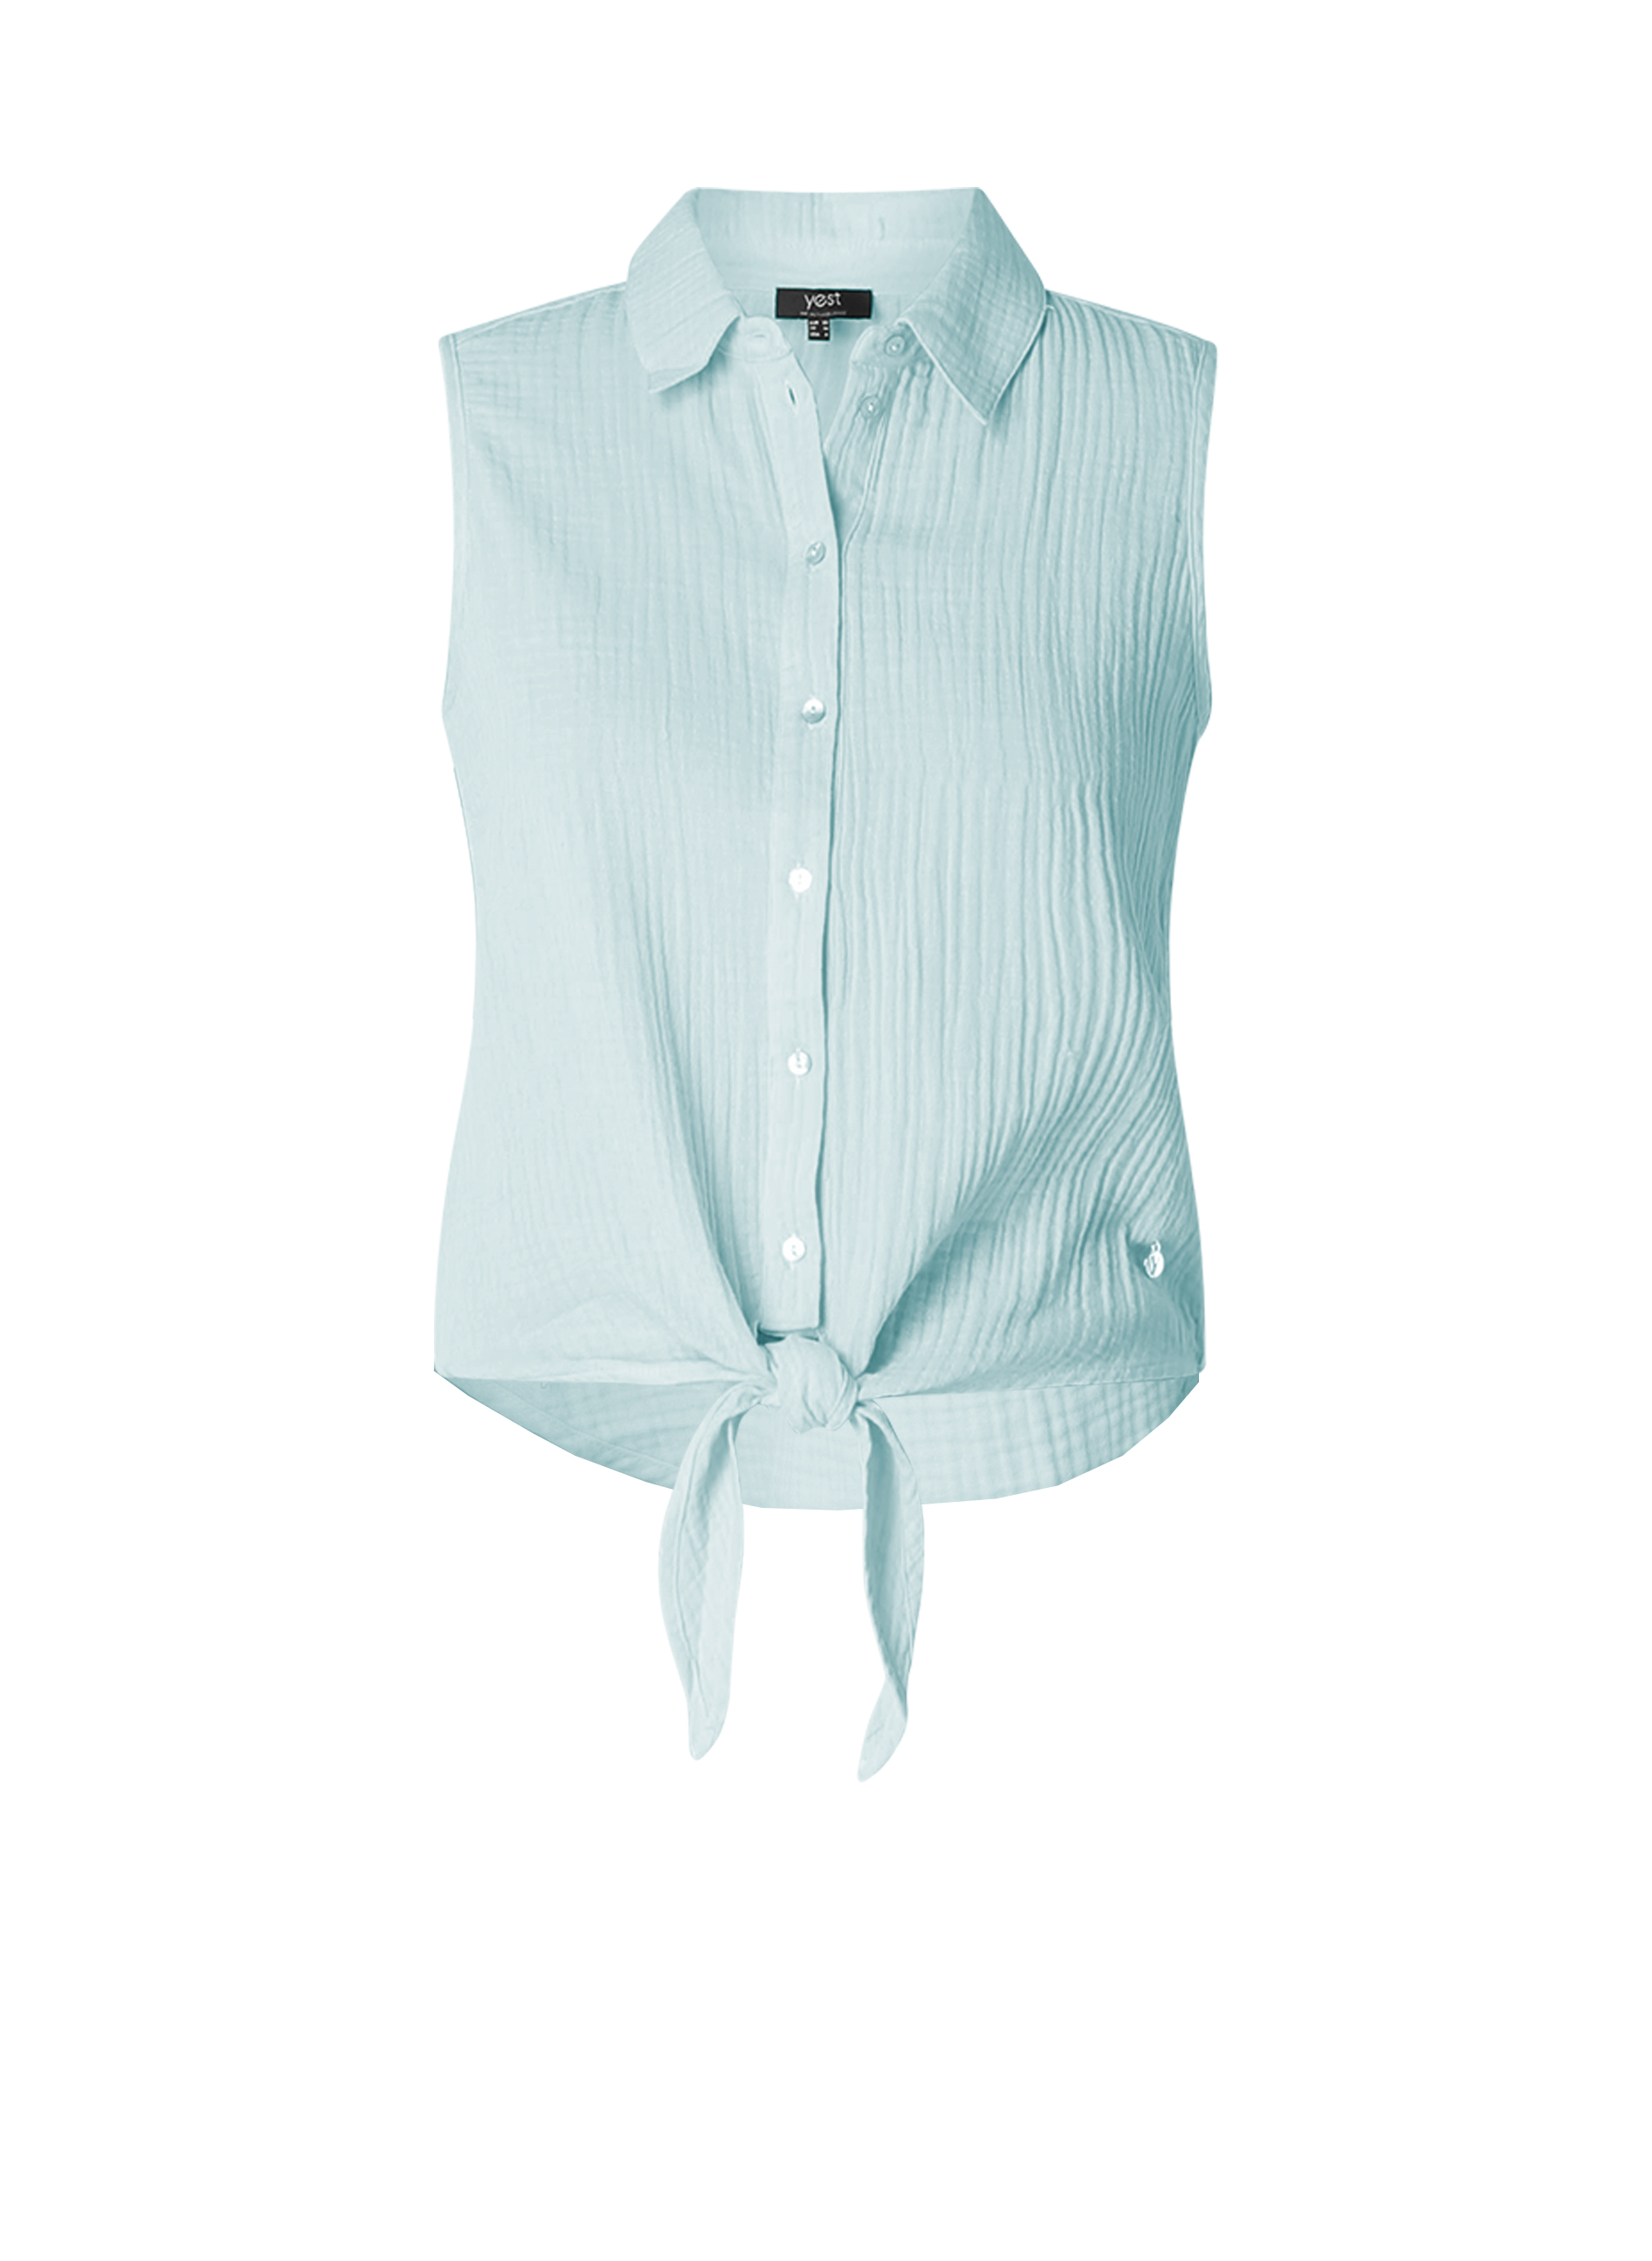 Yest shirt Kady 67 cm